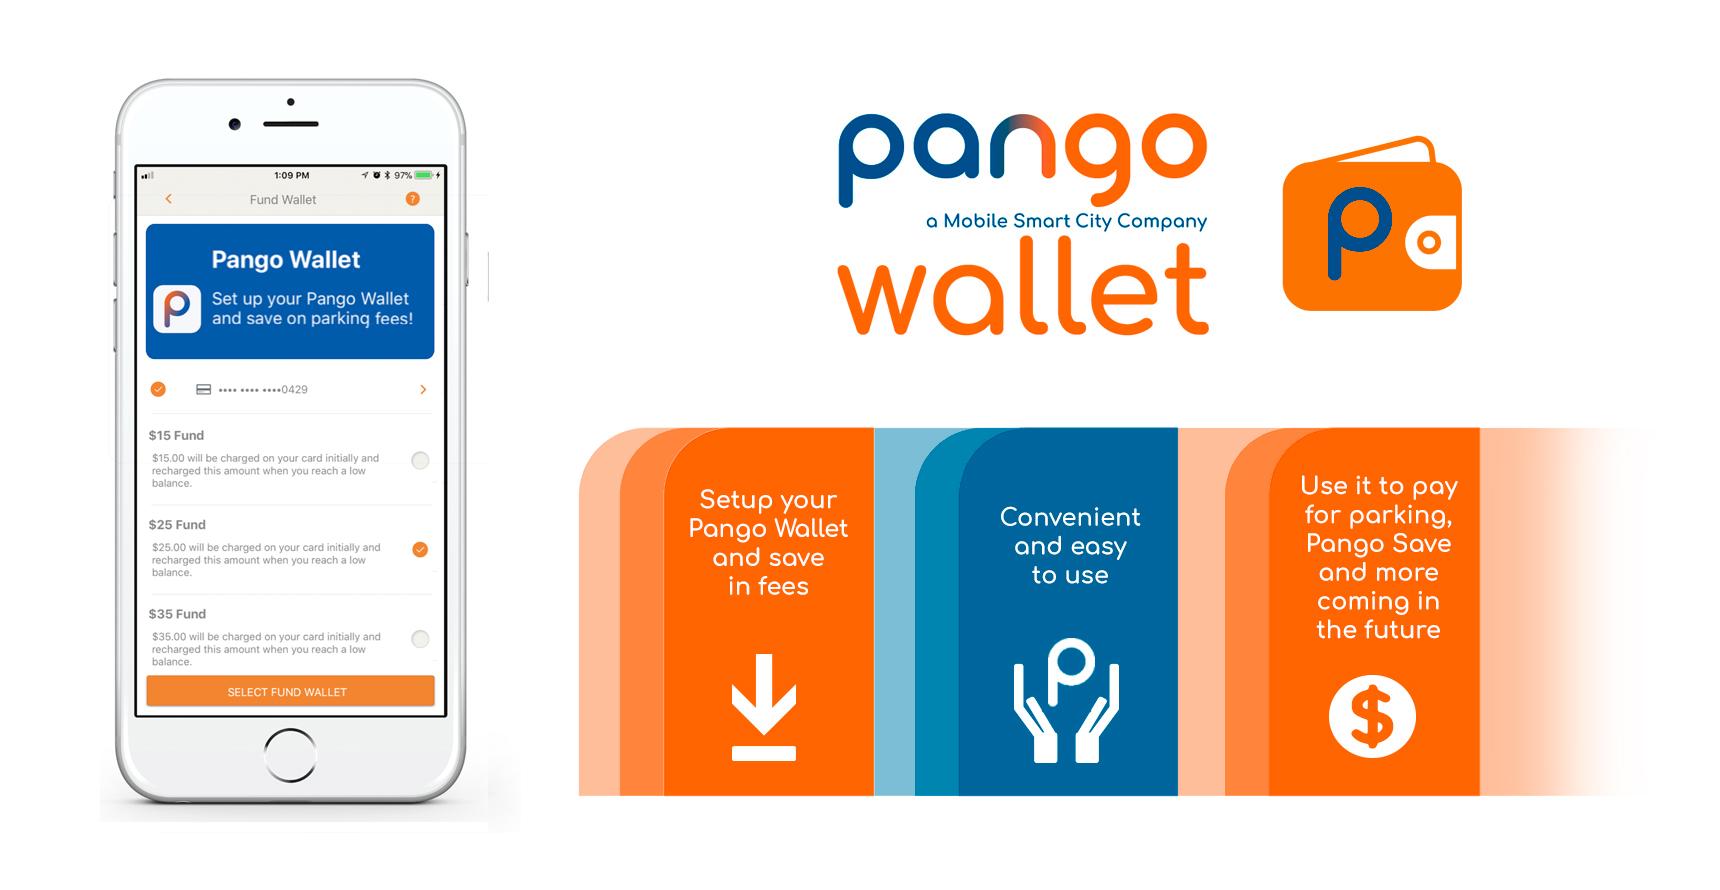 Pango Wallet